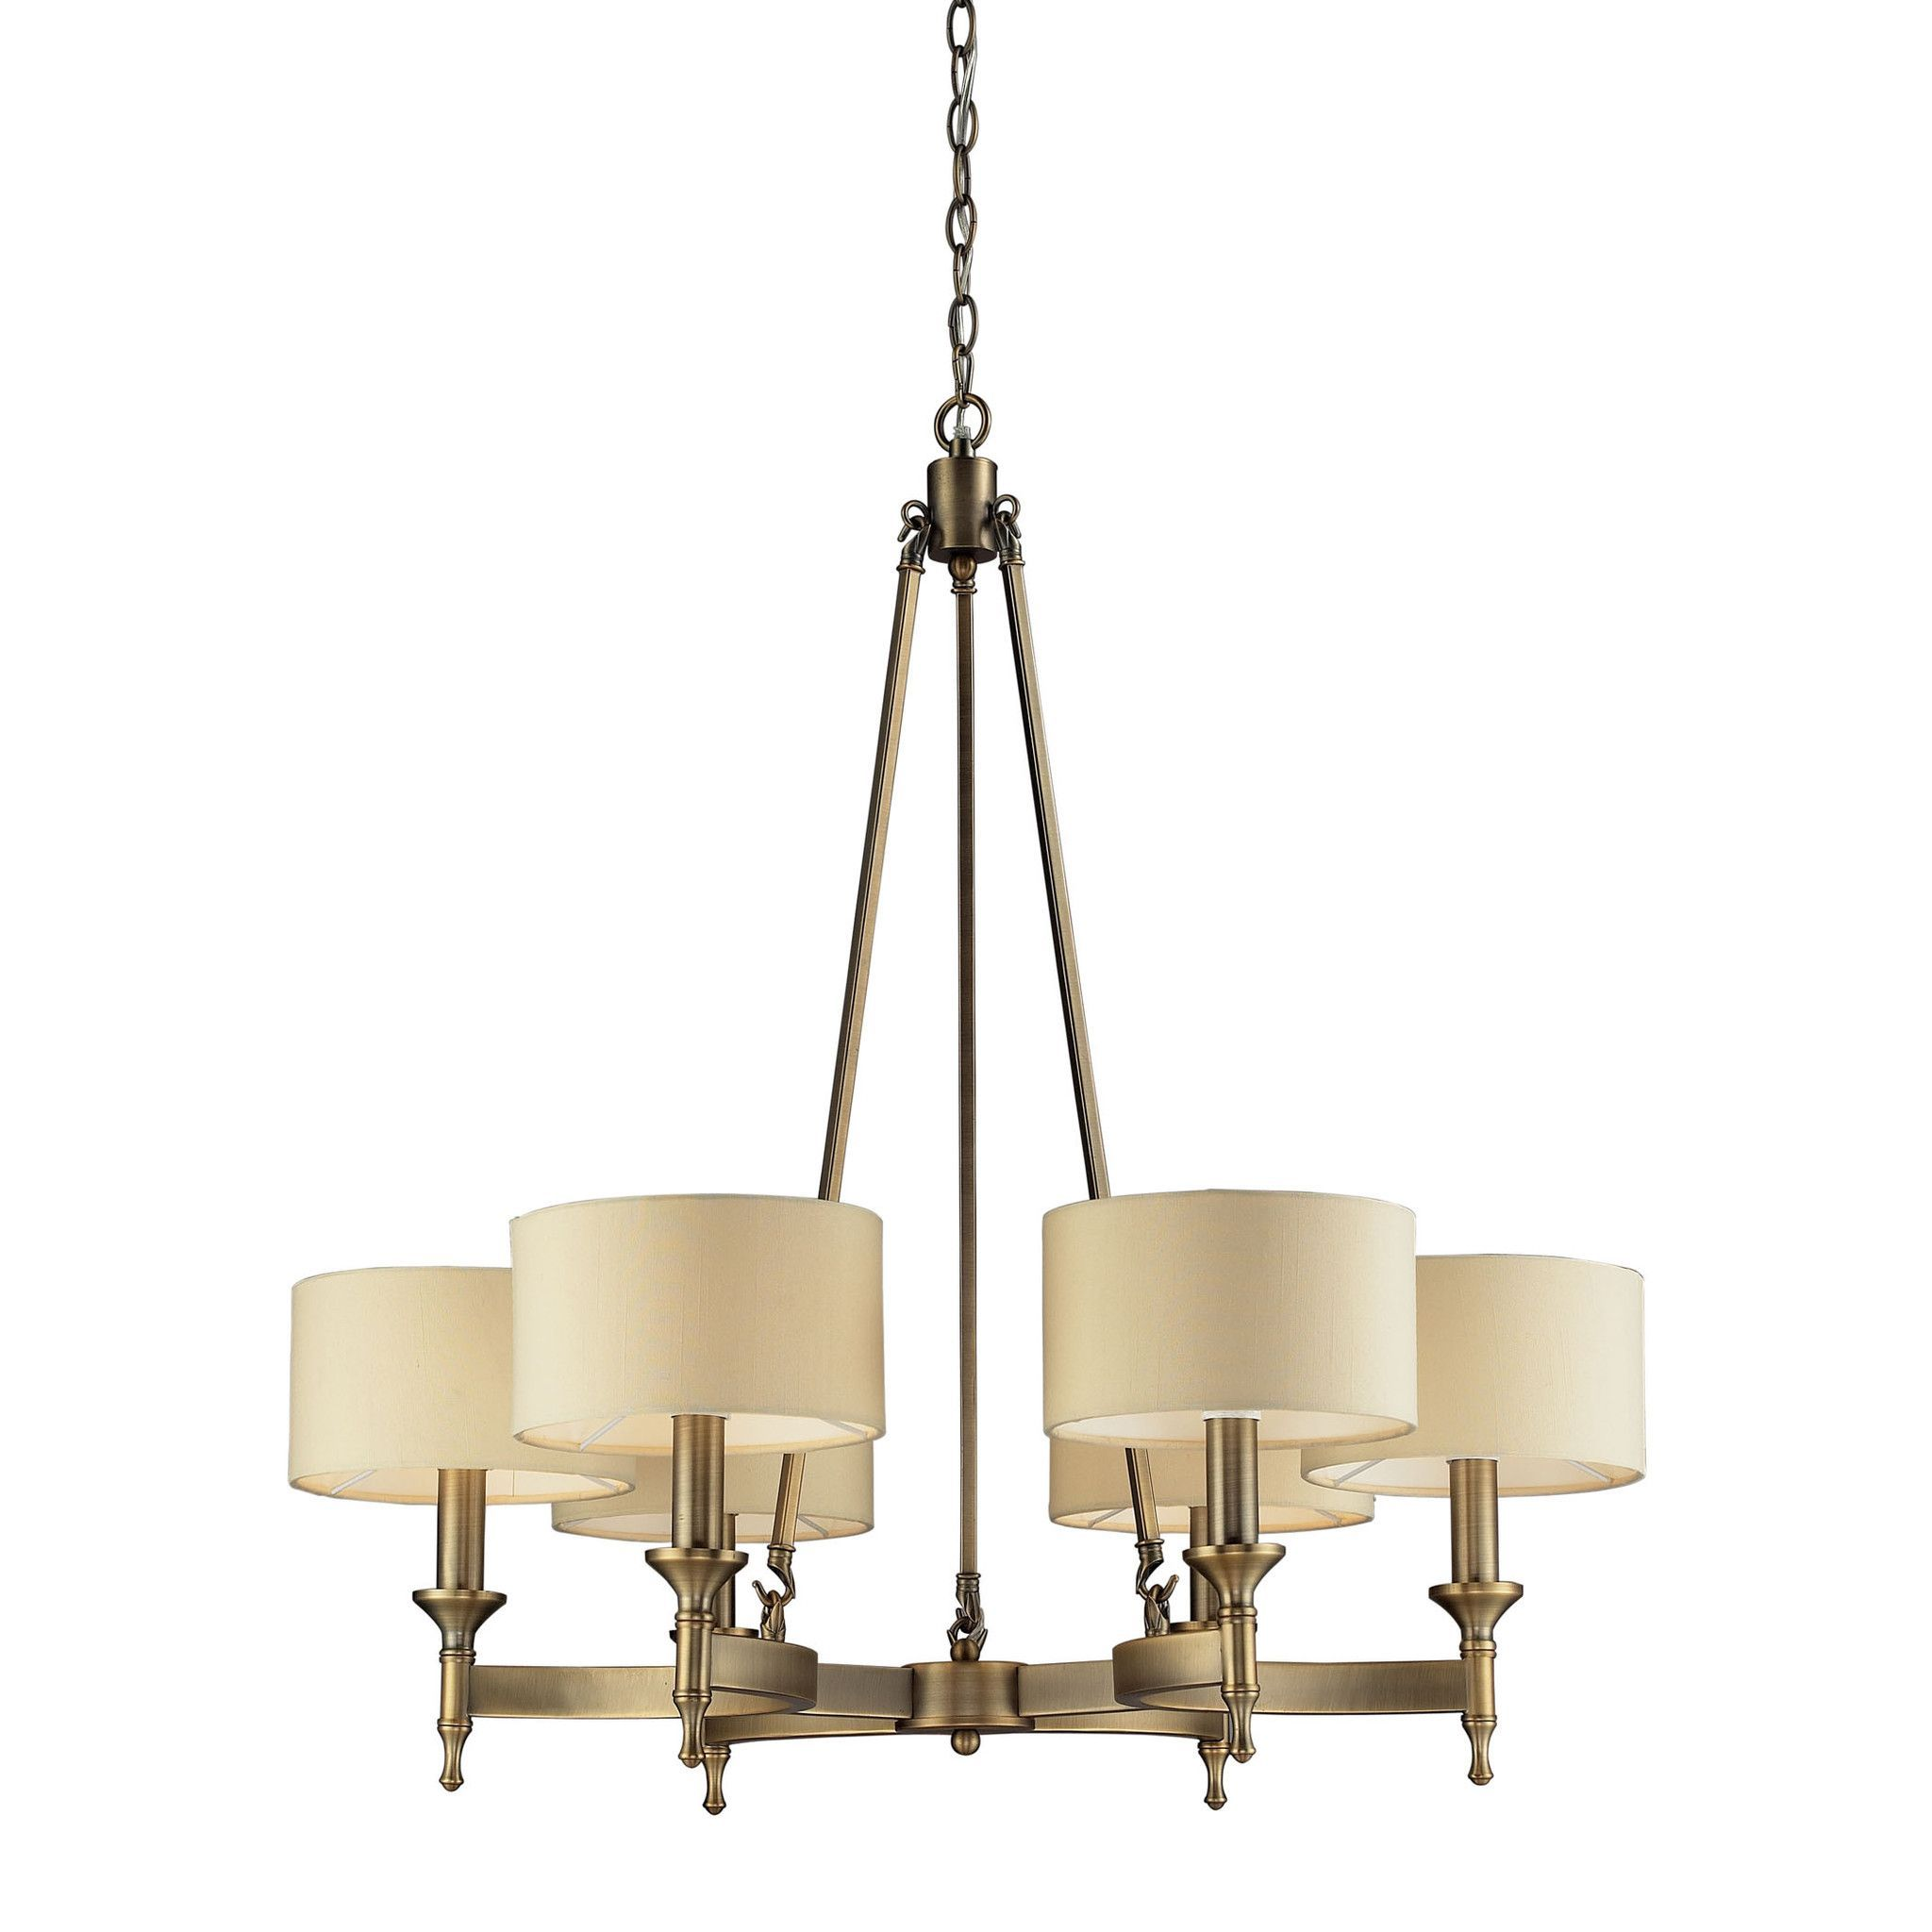 6 light chandelier in antique brass antique brass chandeliers 6 light chandelier in antique brass arubaitofo Images